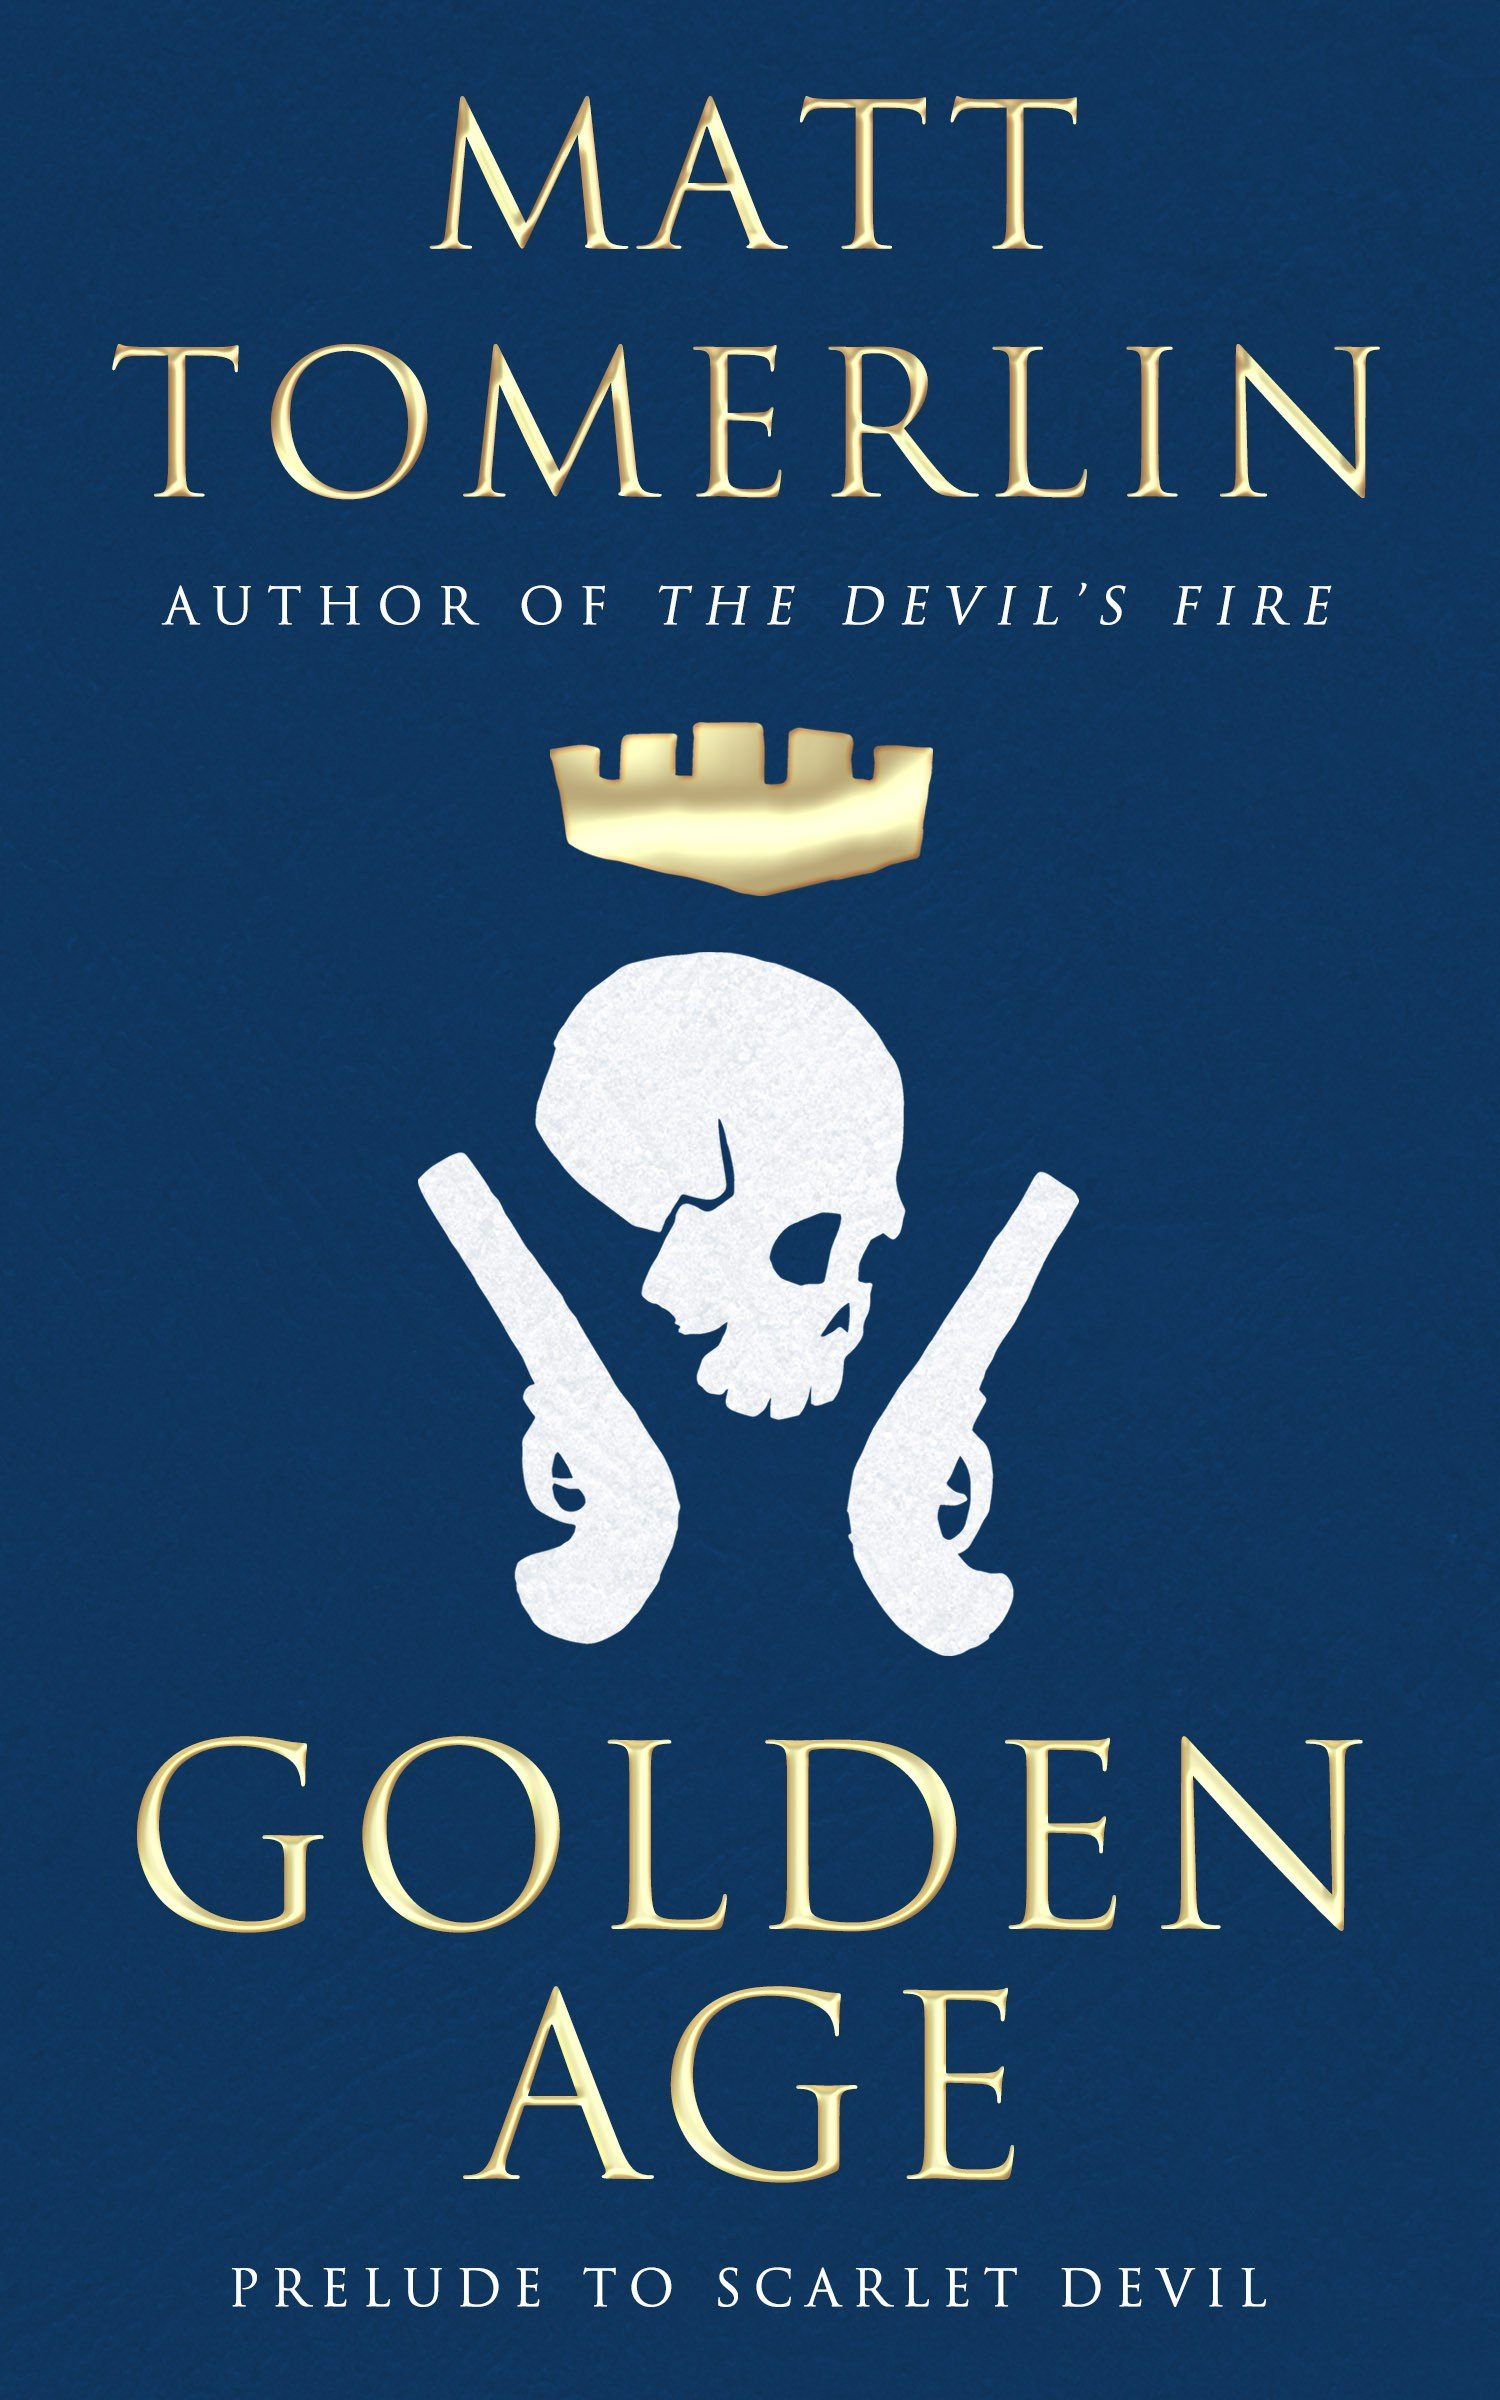 Golden Age by Matt Tomerlin: Prelude to Scarlet Devil